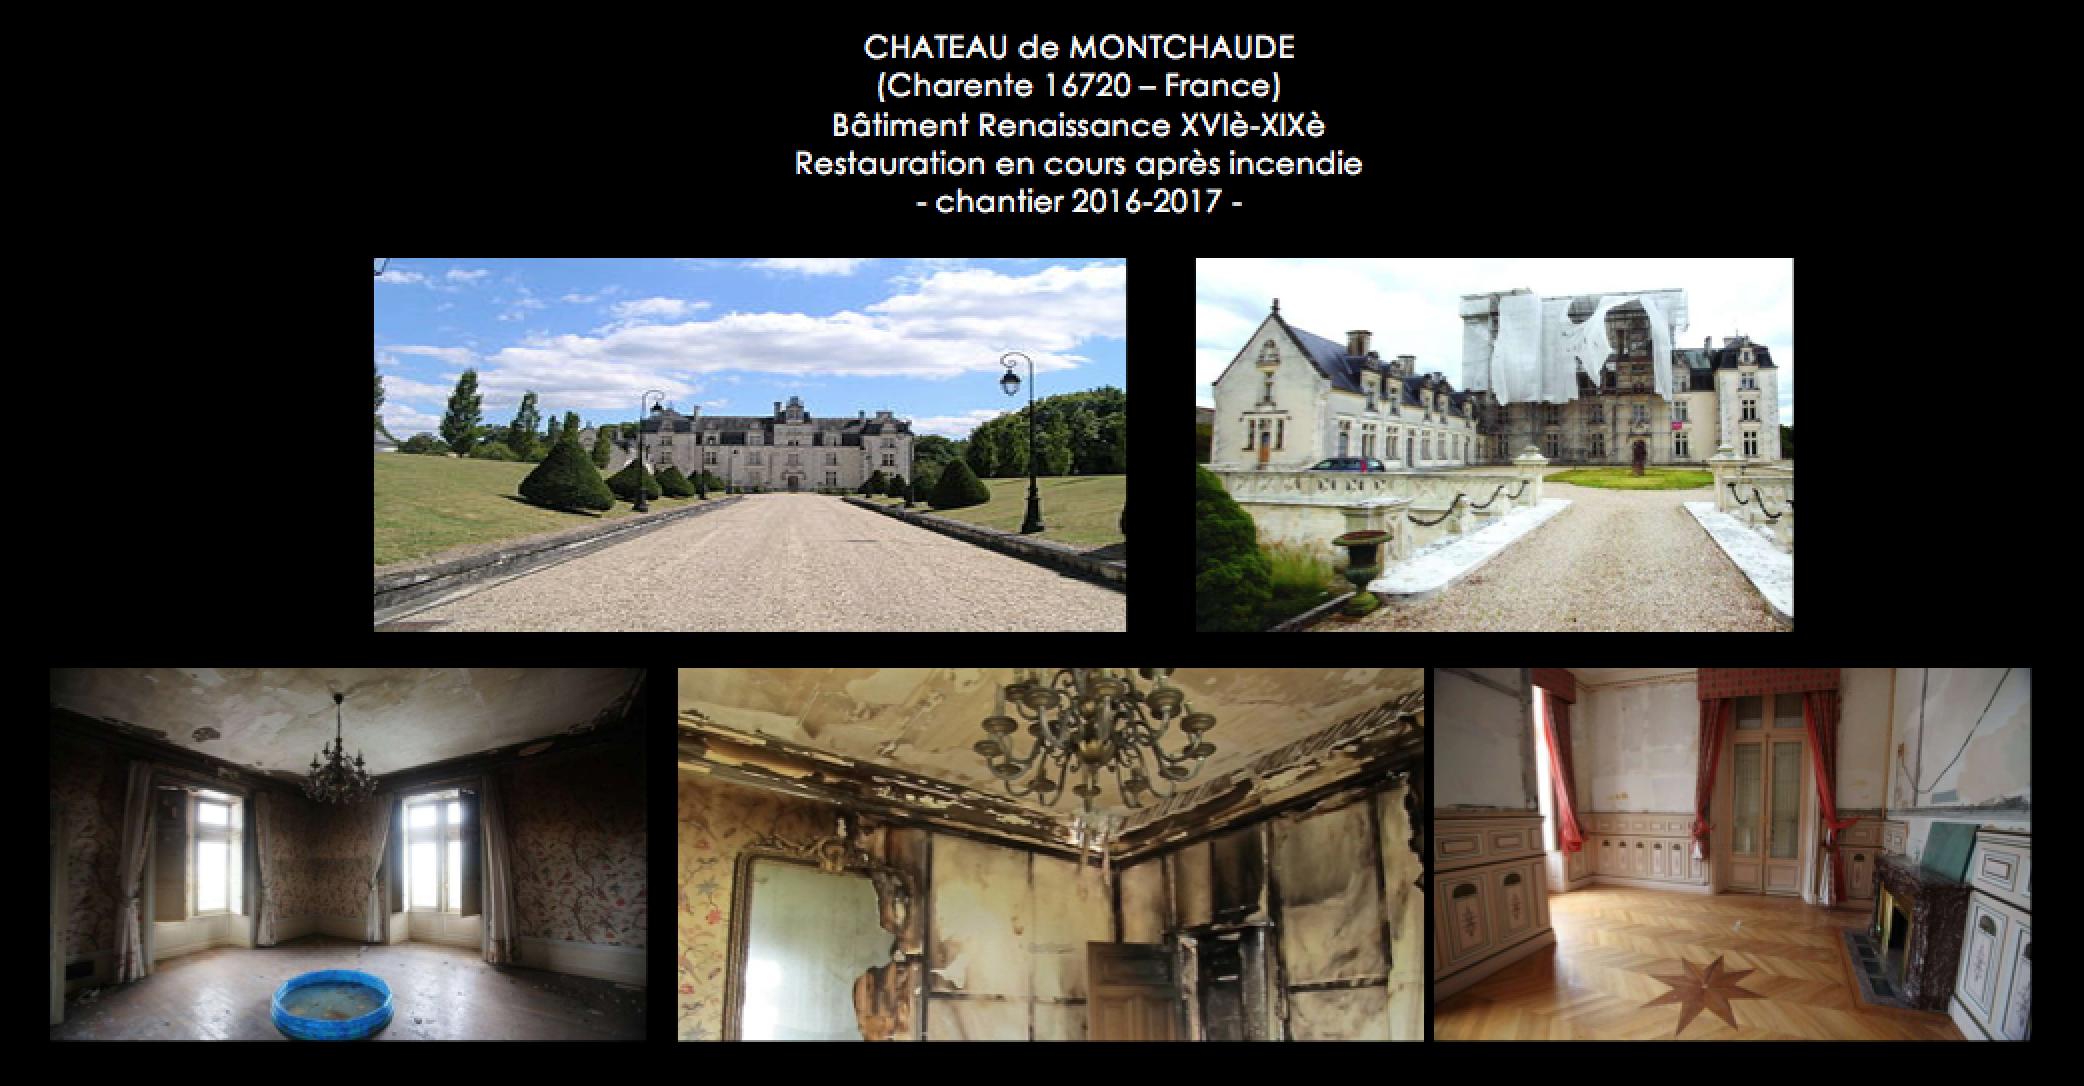 Restauration (Chantier 2017) Château de Montechaude (Charente) - France